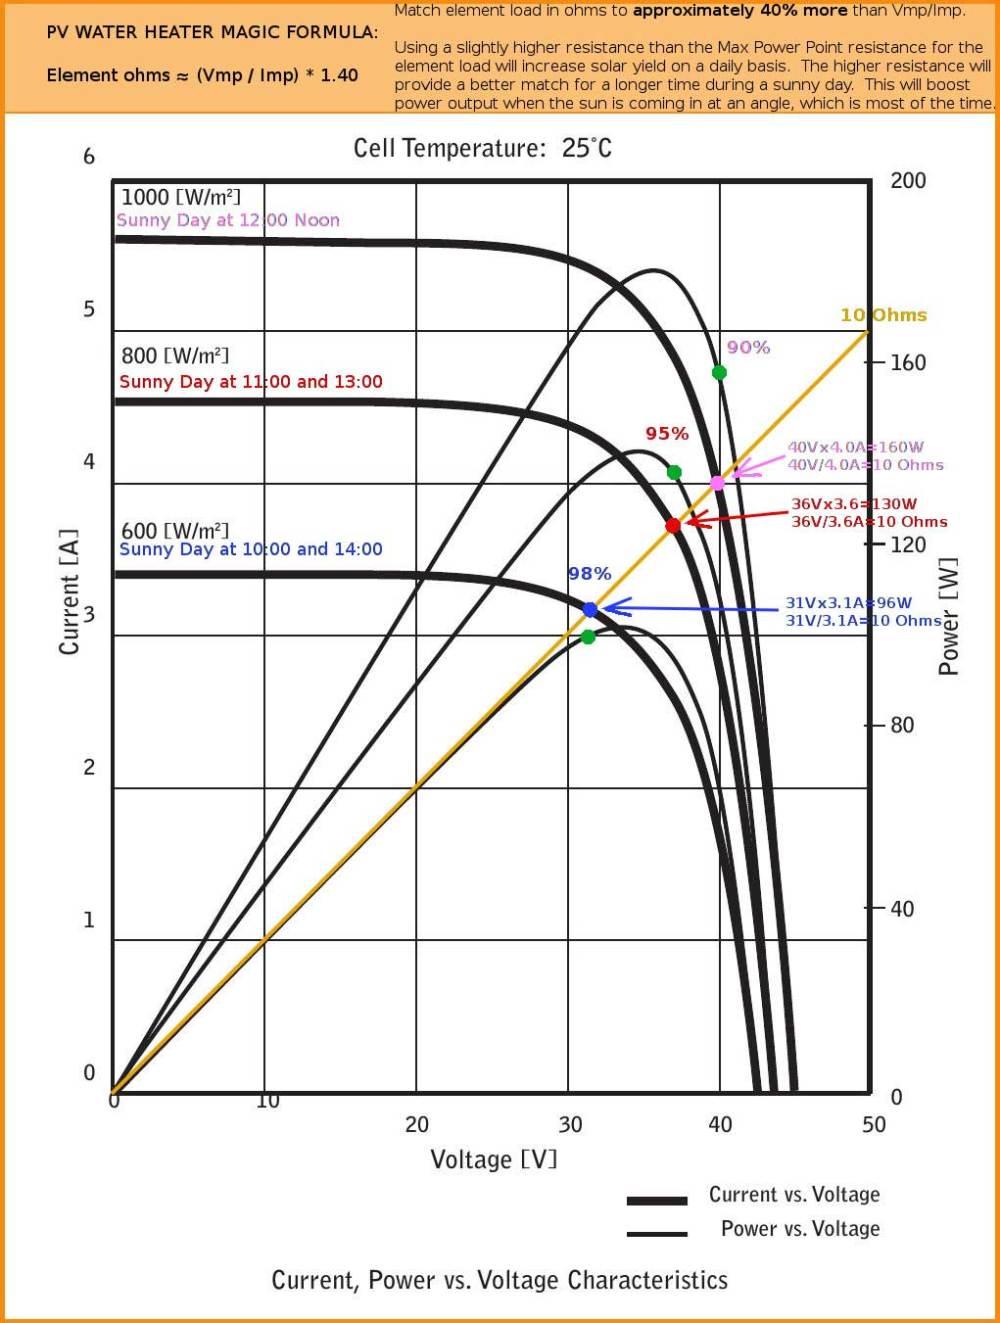 medium resolution of larger image 3 pv magic water heater formula element ohms equal vmp imp x 1 40